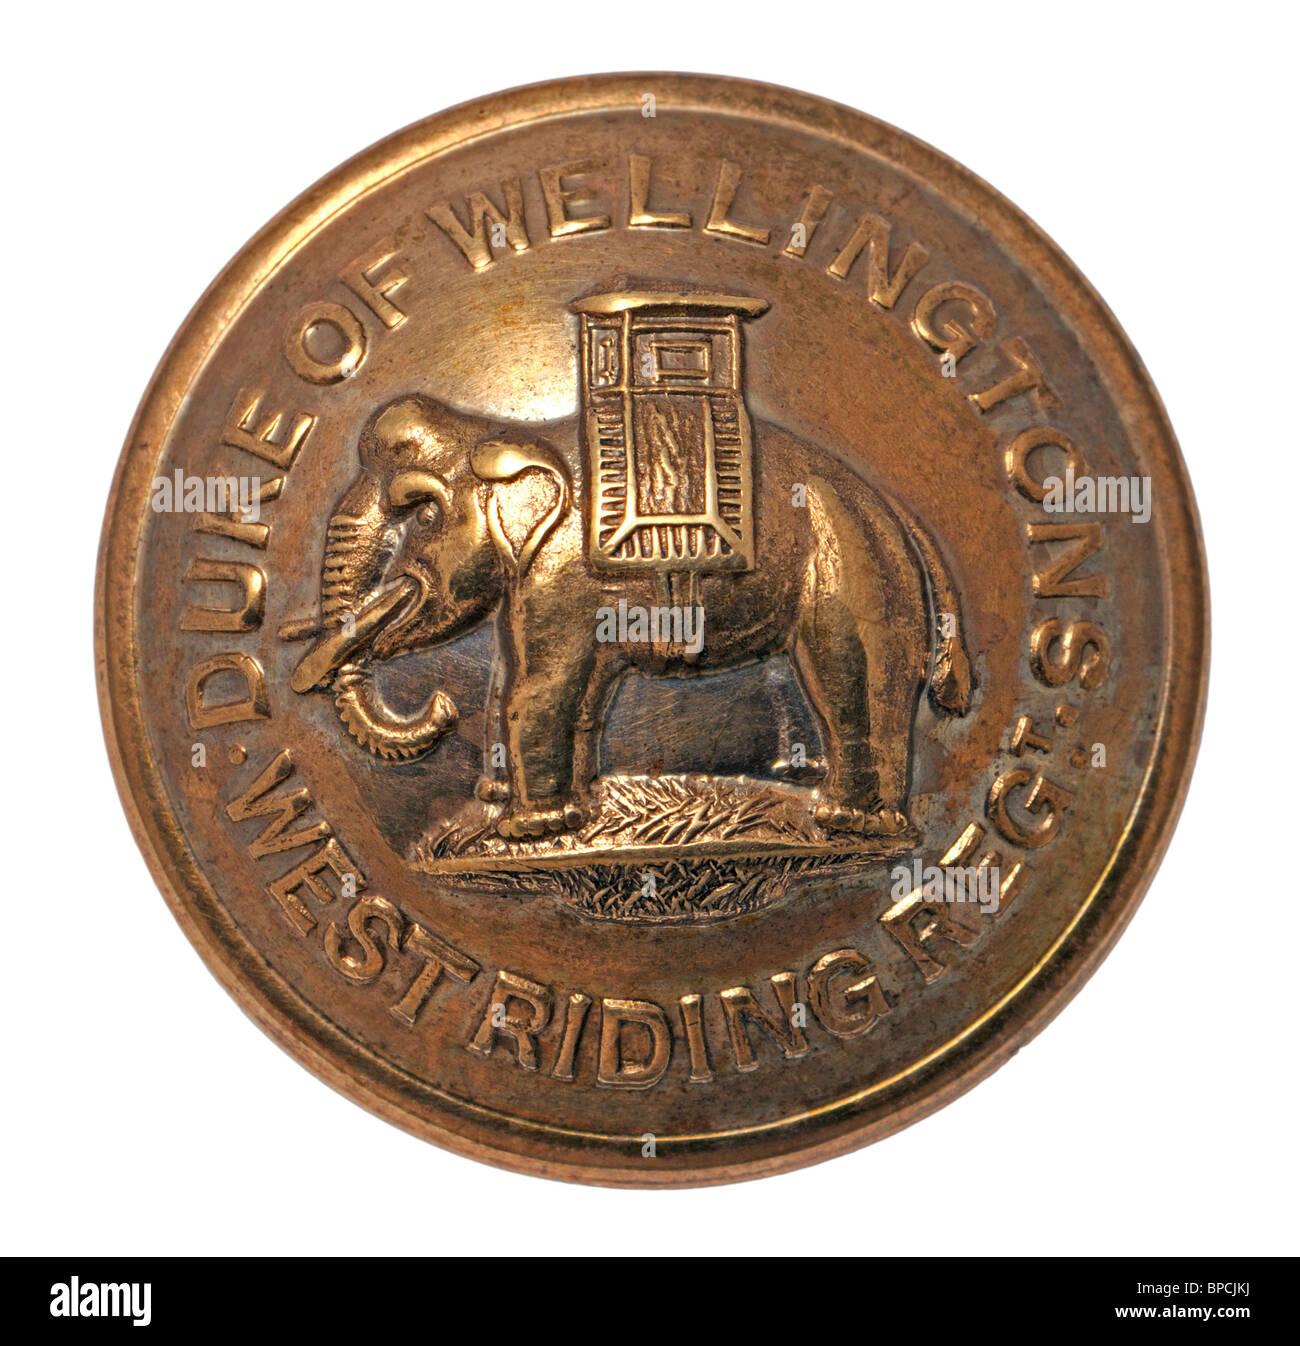 British Military Brass Button - Duke of Wellington West Riding Regiment - Stock Image